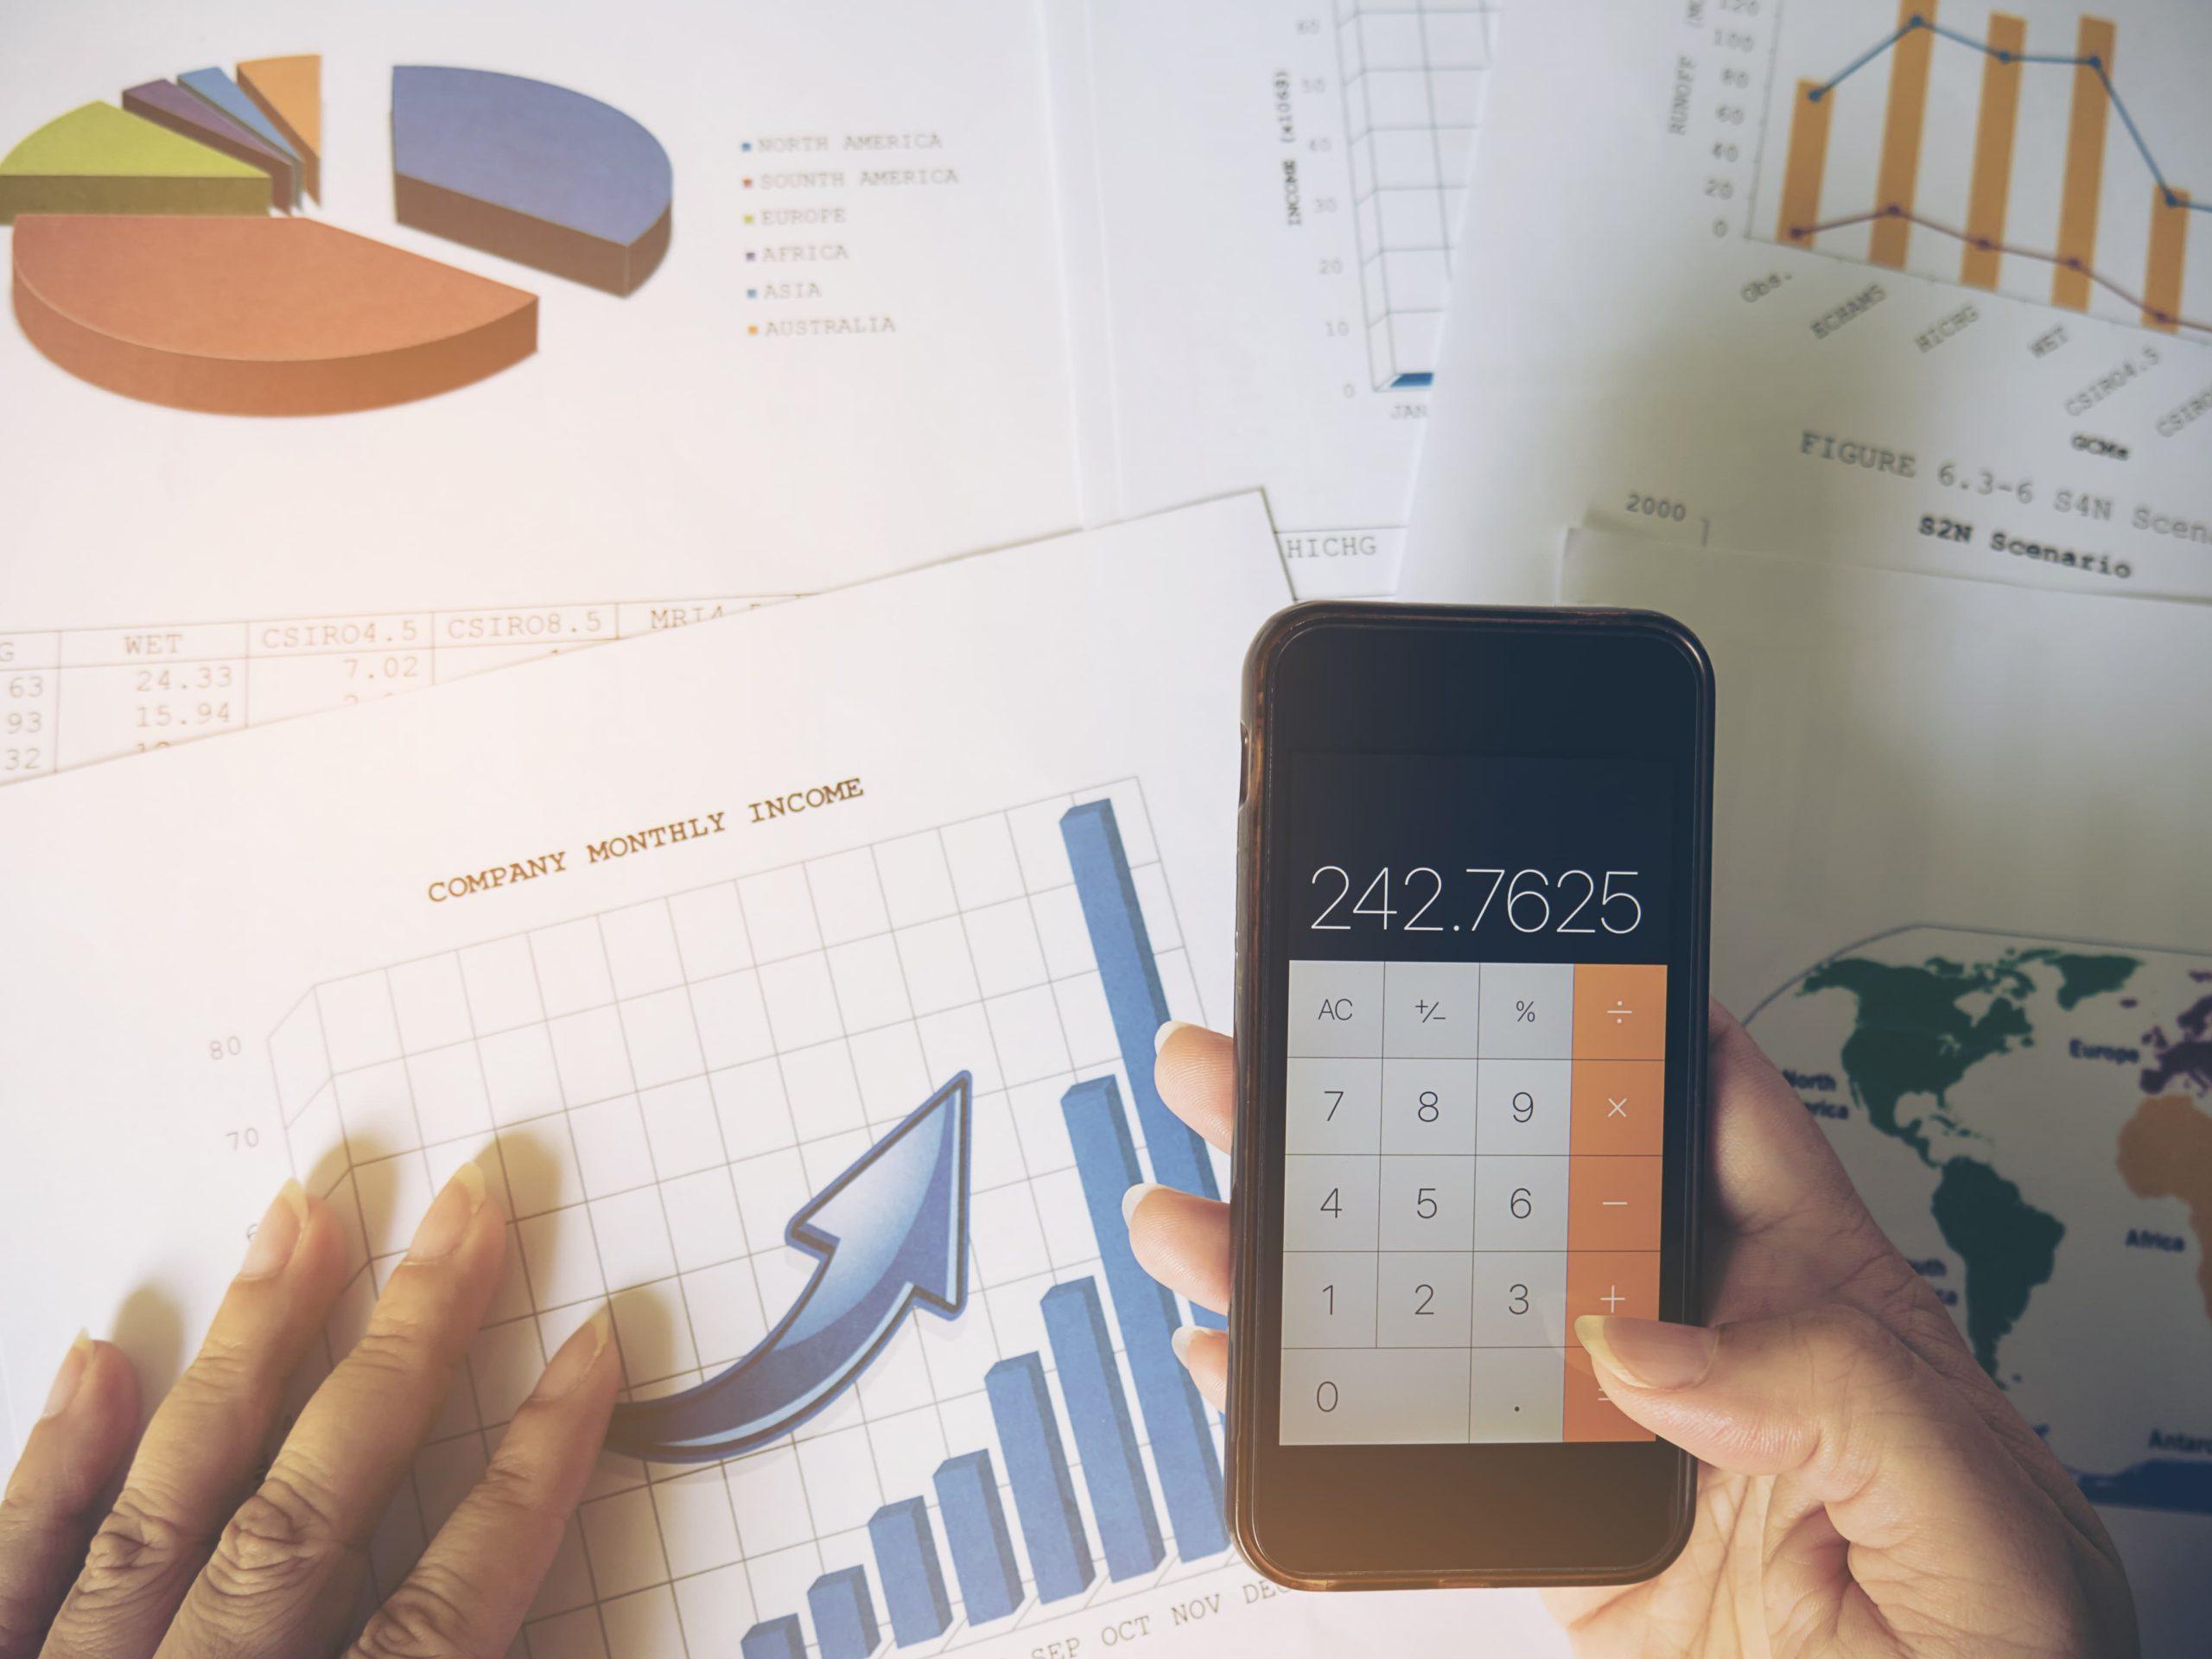 https://mjmeurope.com/media/2020/07/Business-Strategy-Image1-min-scaled.jpg